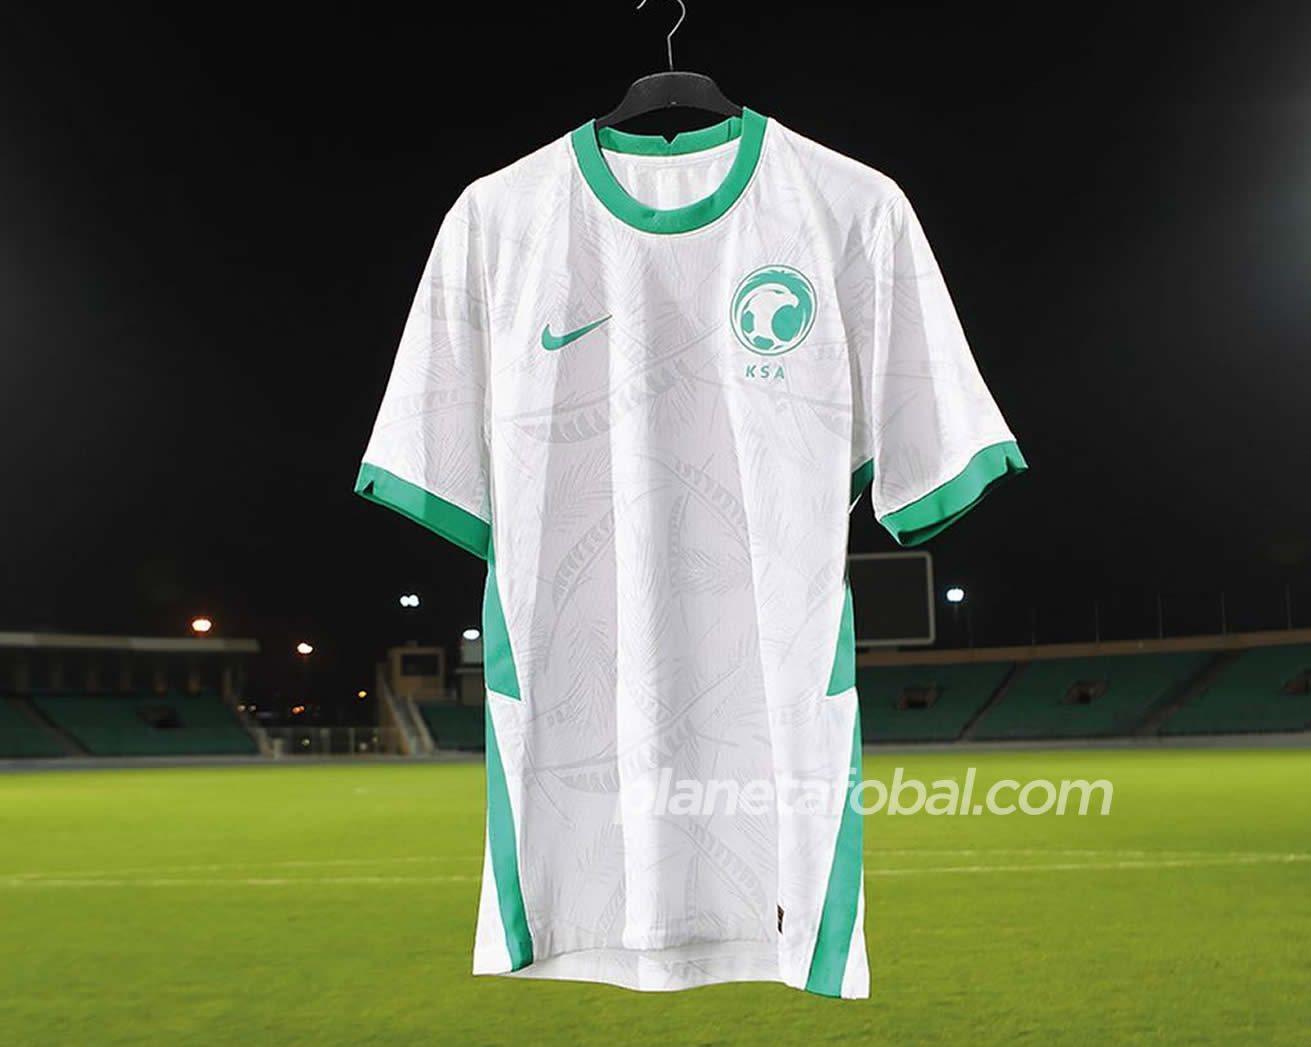 Camisetas Nike de Arabia Saudita 2020/2021 | Imagen SAFF